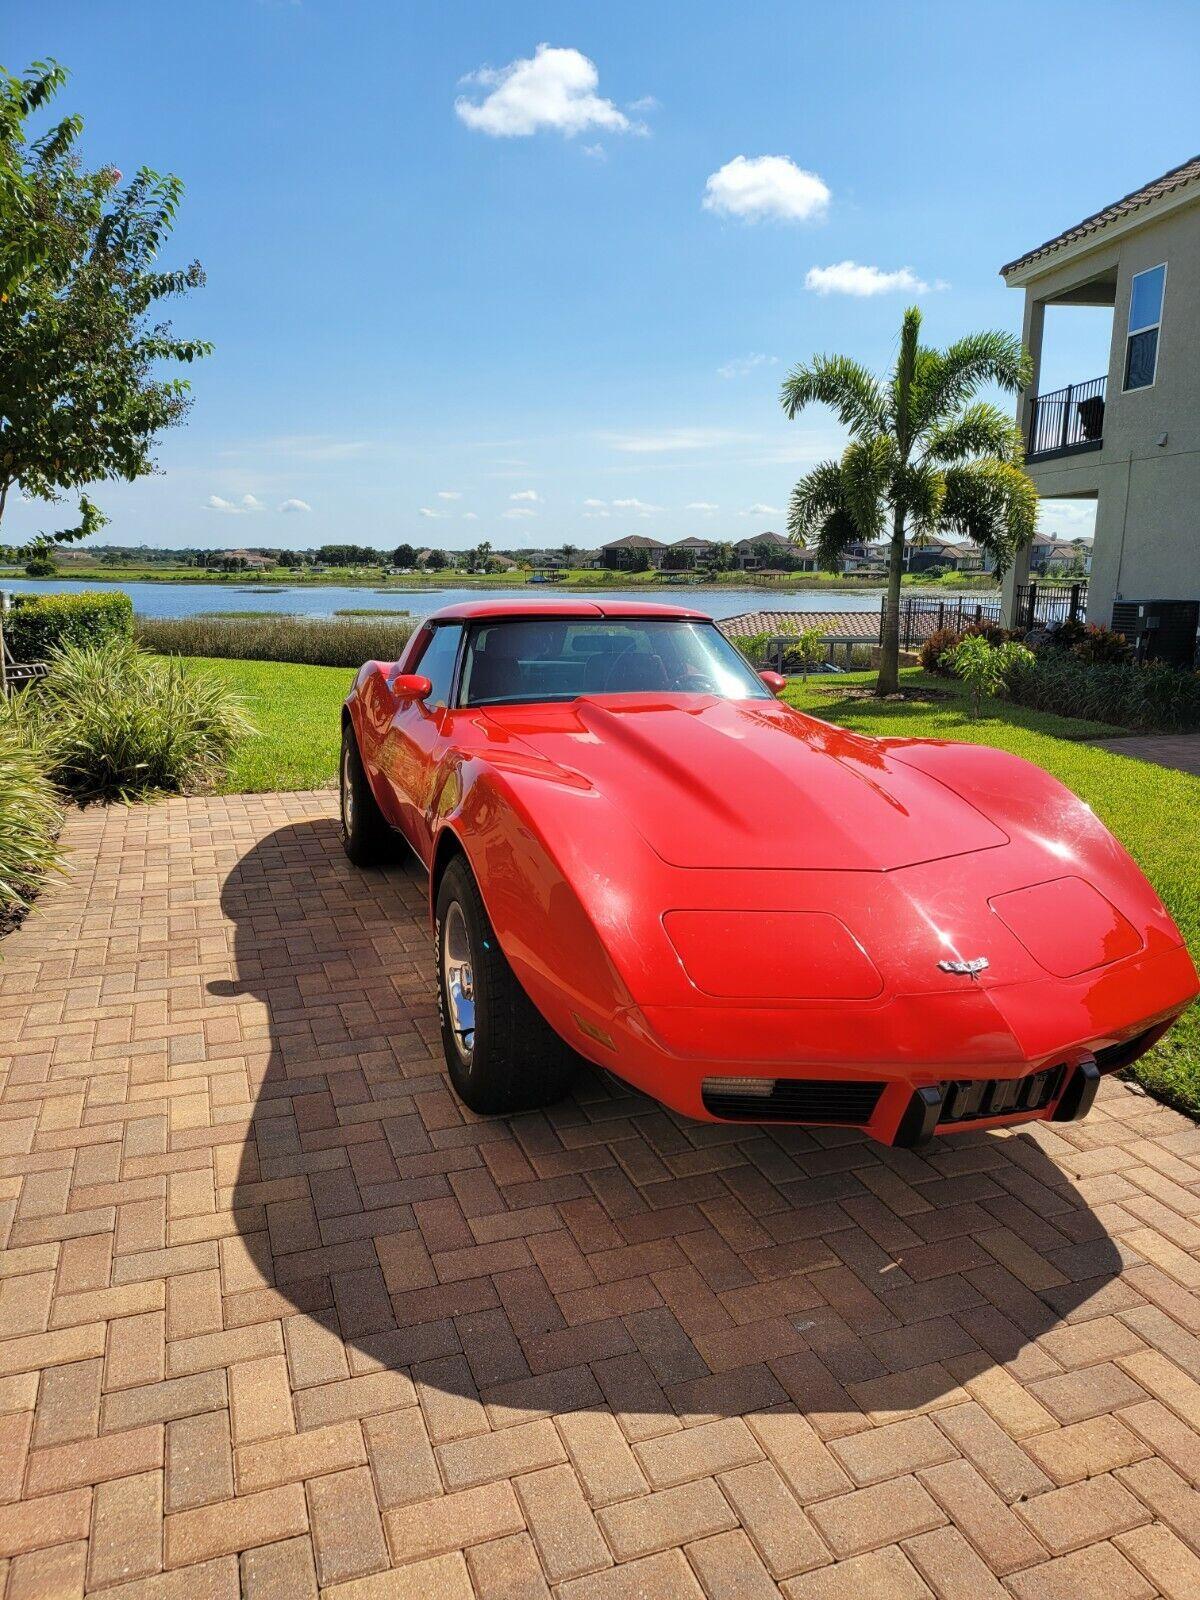 1979 Red Chevrolet Corvette   | C3 Corvette Photo 1